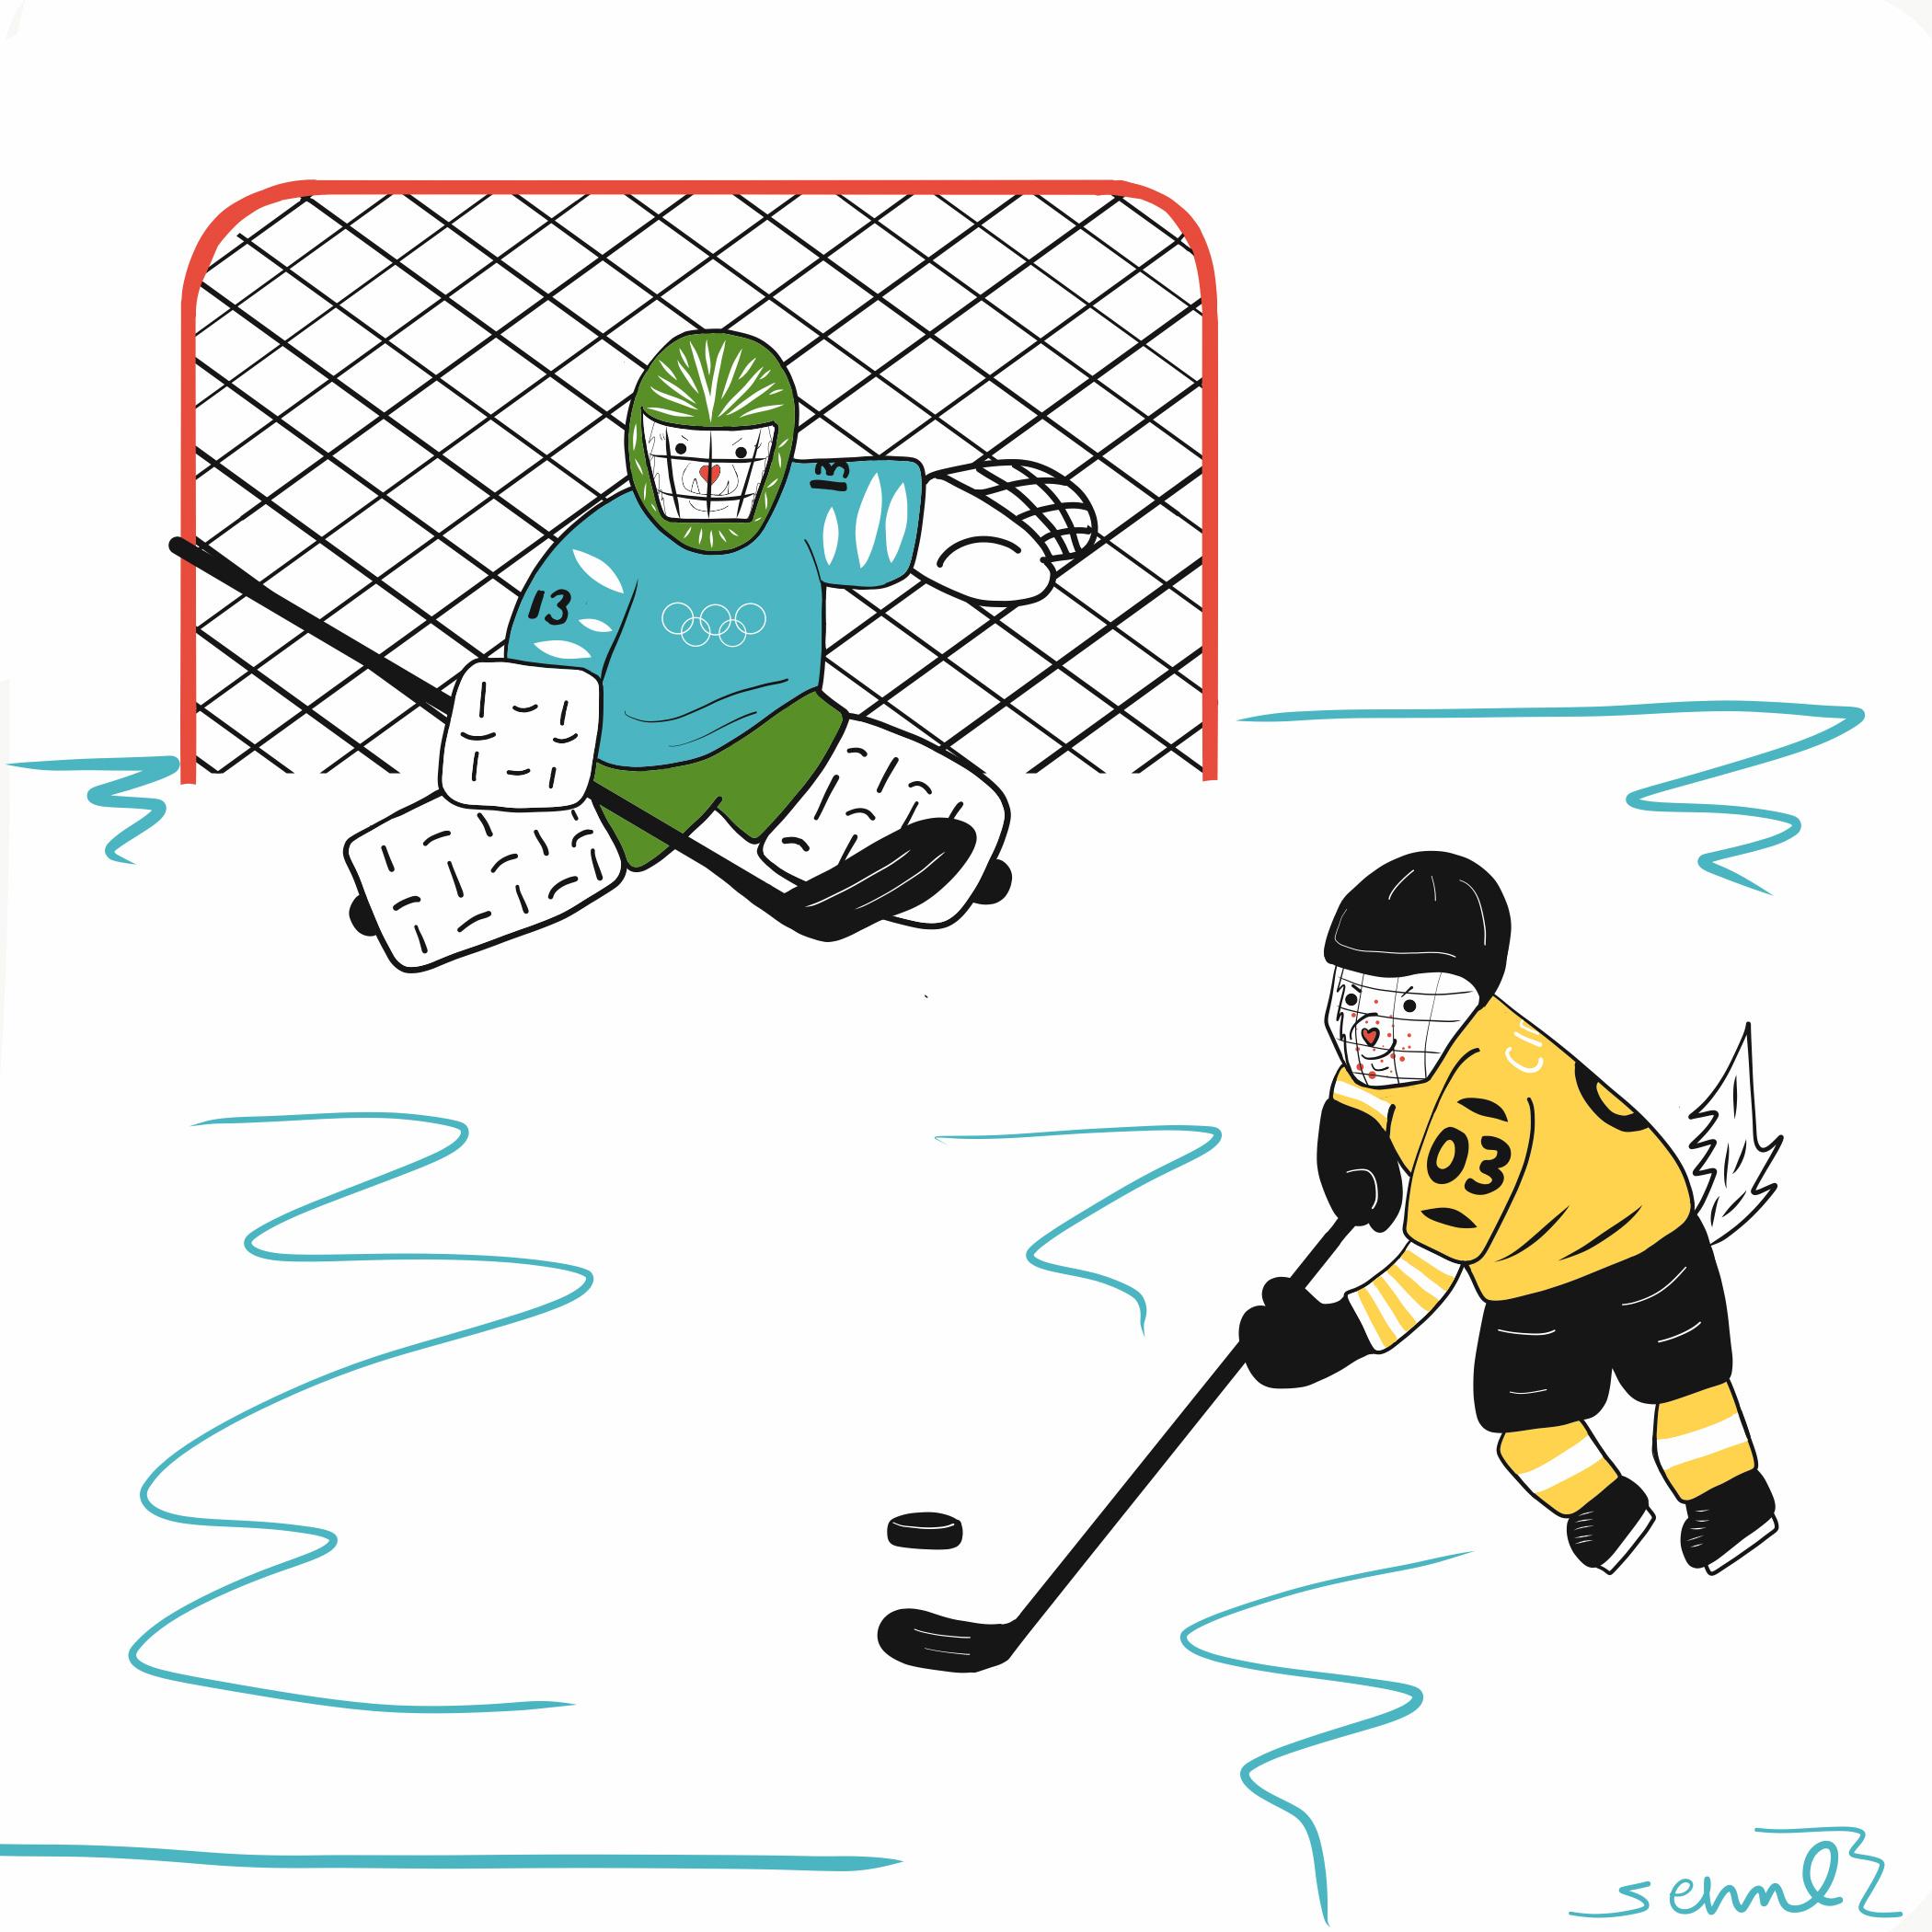 Cider and Miso: Hockey